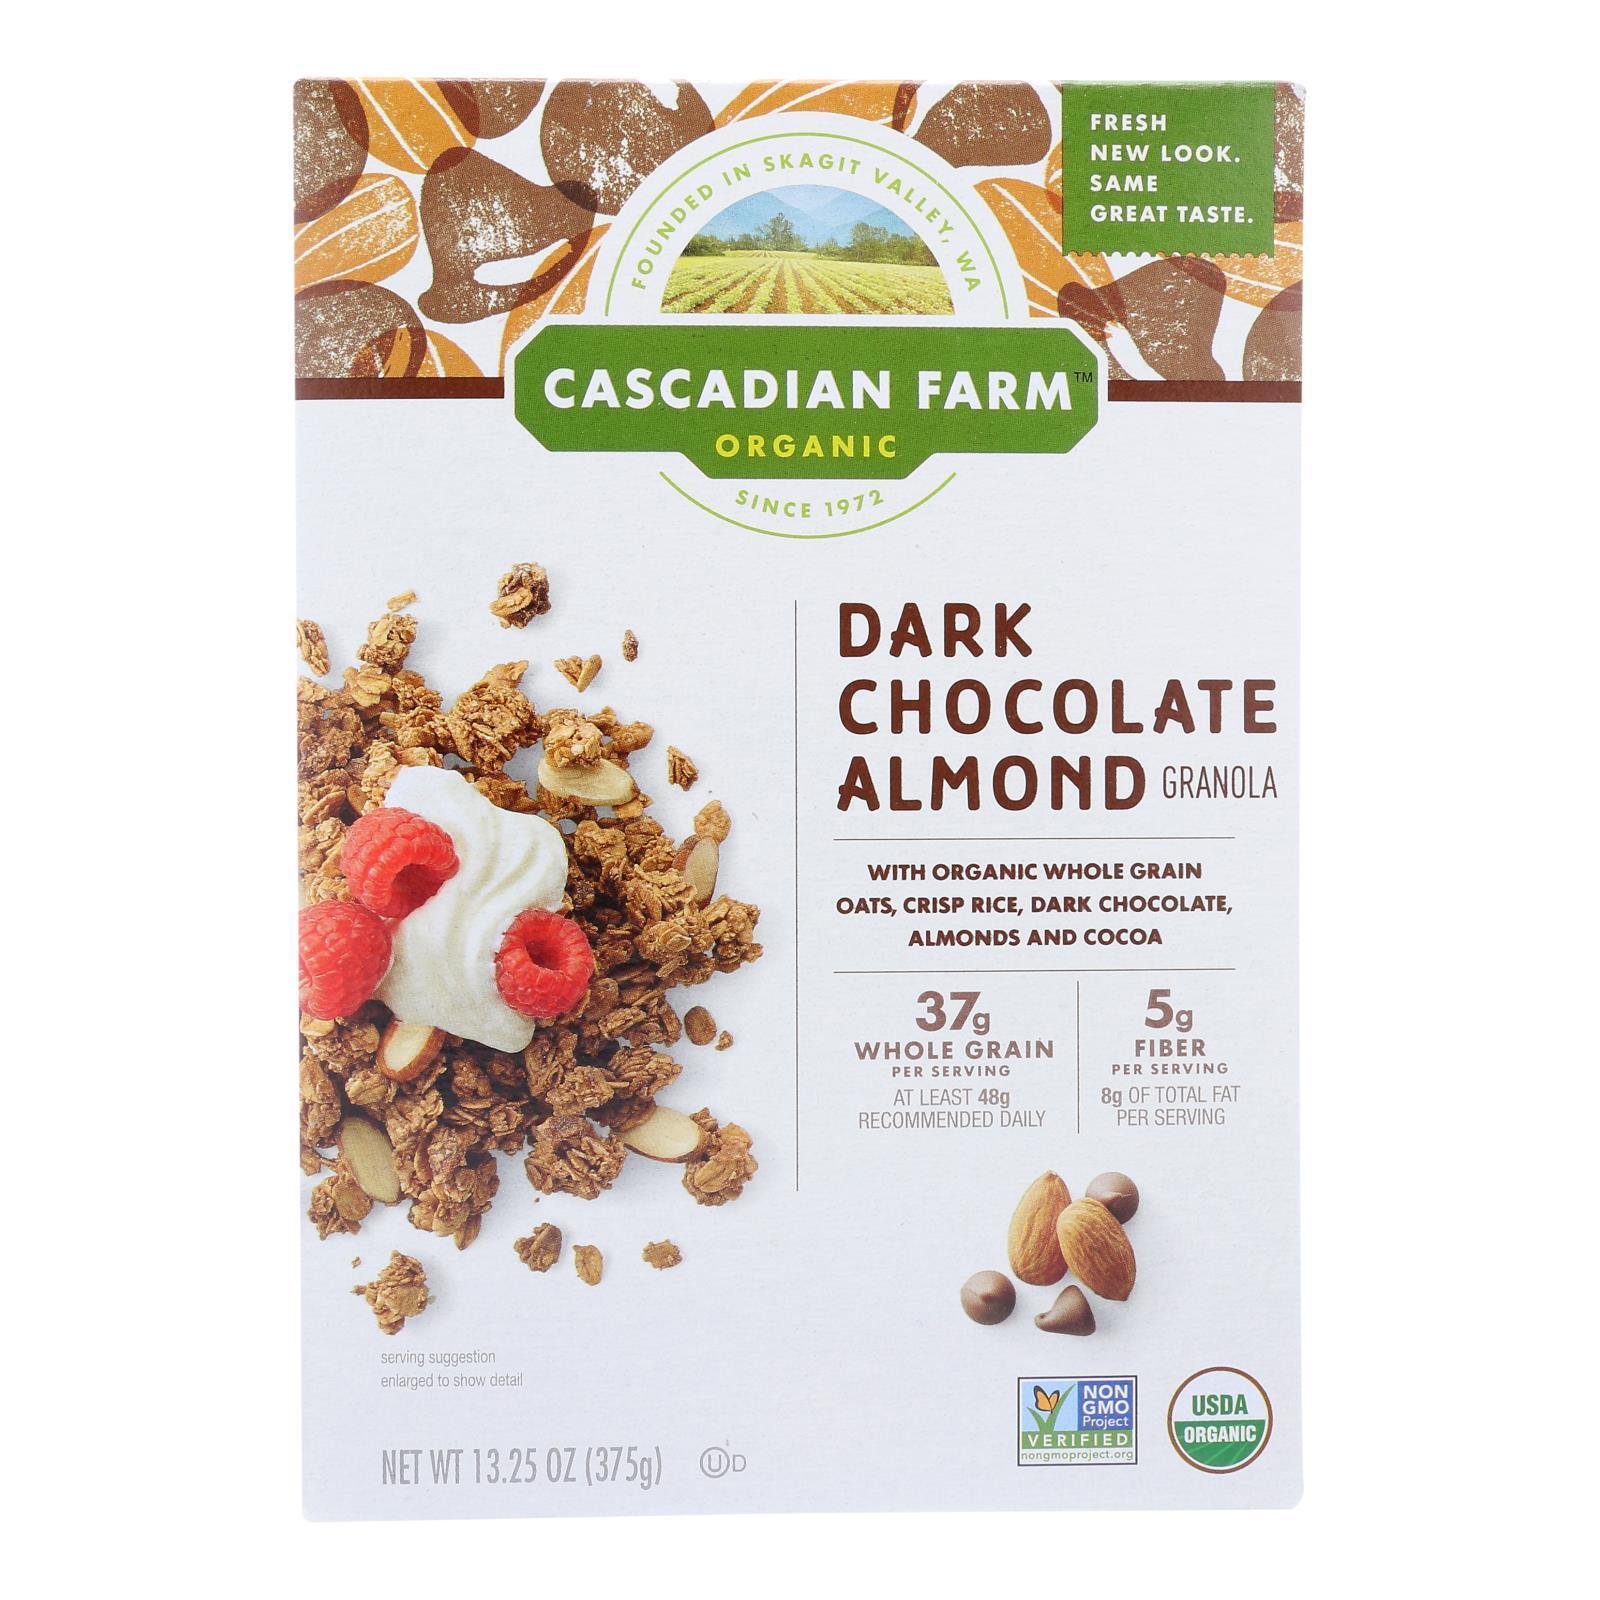 Cascadian Farm Granola - Organic - Dark Chocolate Almond - 13.25 oz - case of 6